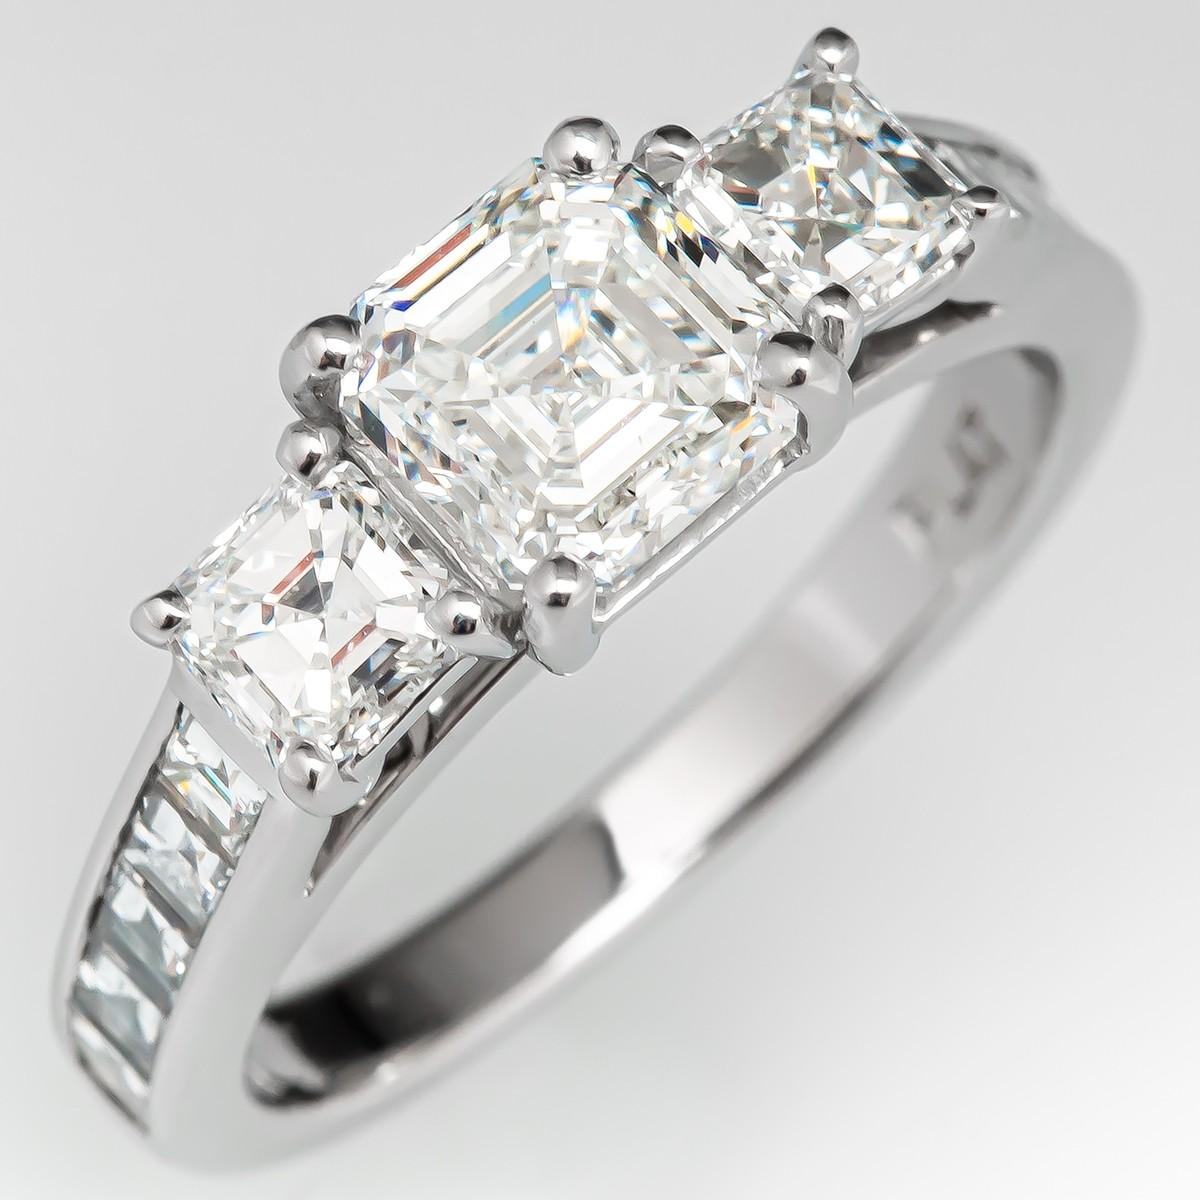 Square Emerald Cut Diamond Engagement Ring Three Stone 1 23ct G Si1 Gia